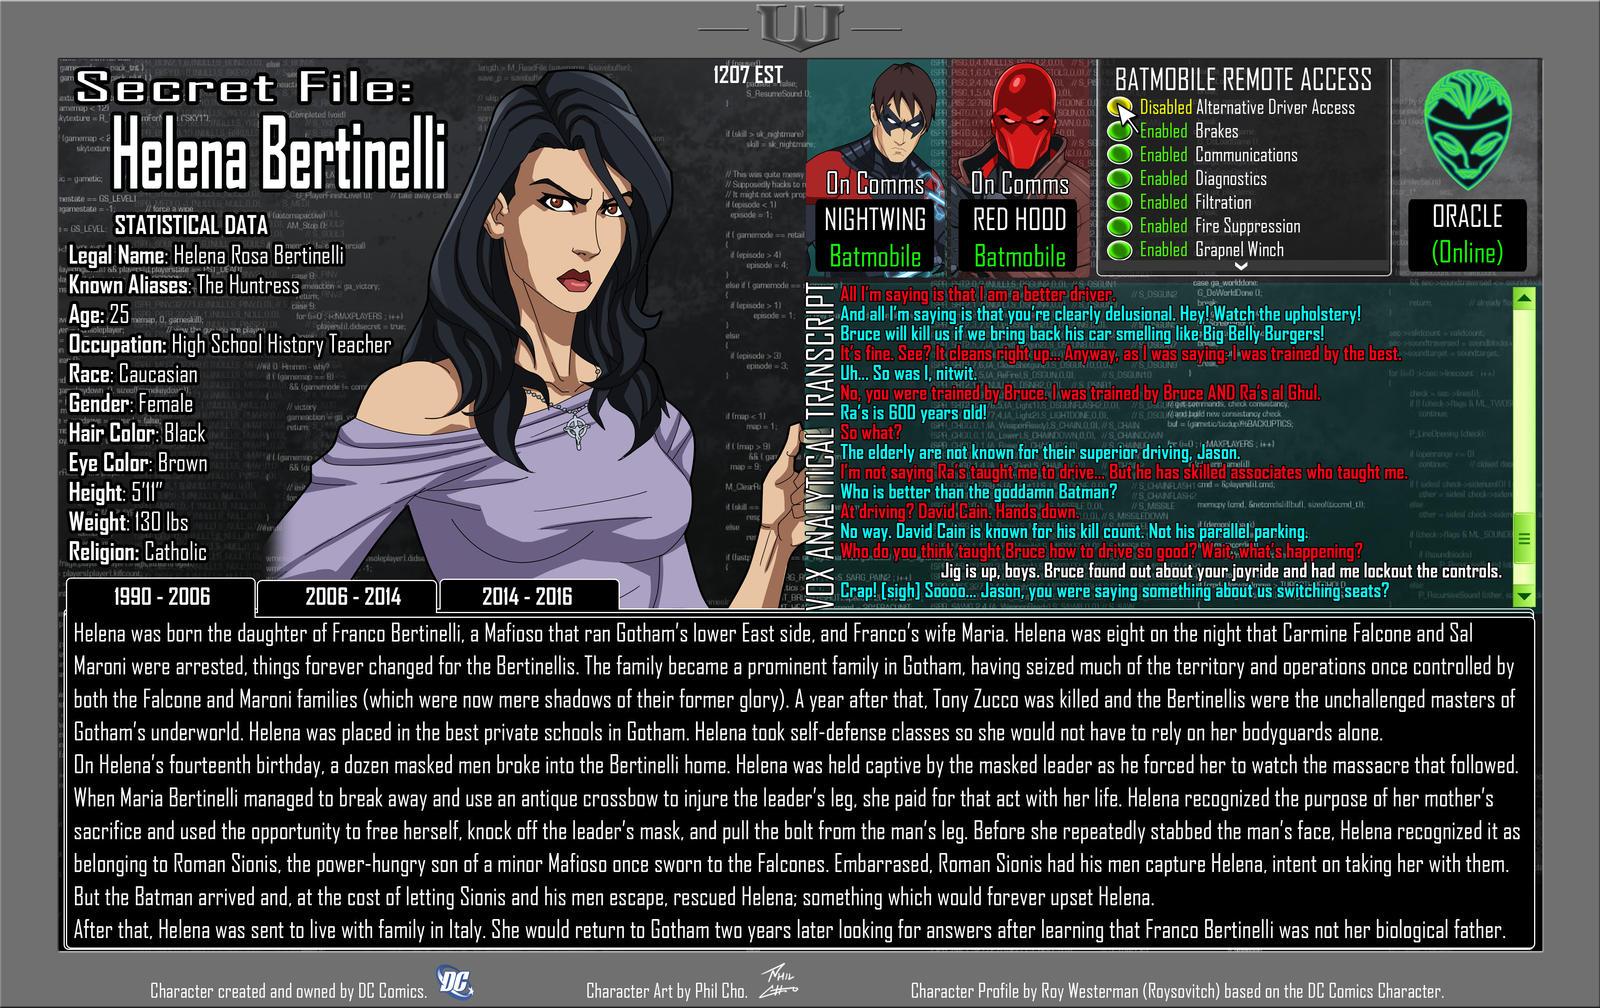 Oracle Files - Helena Bertinelli 1990-2006